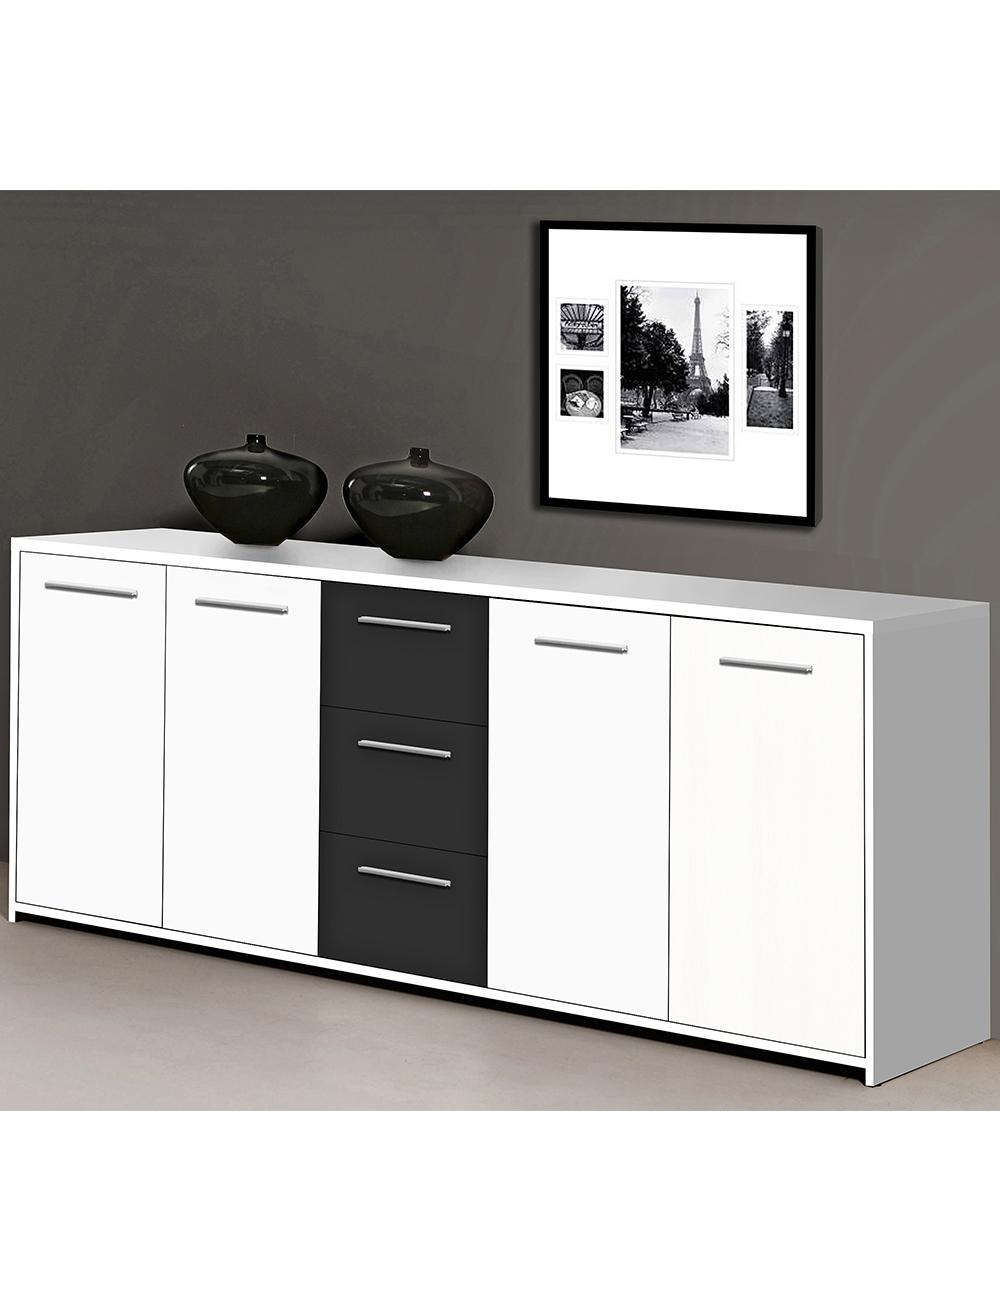 sideboard lounge weiss schwarz. Black Bedroom Furniture Sets. Home Design Ideas